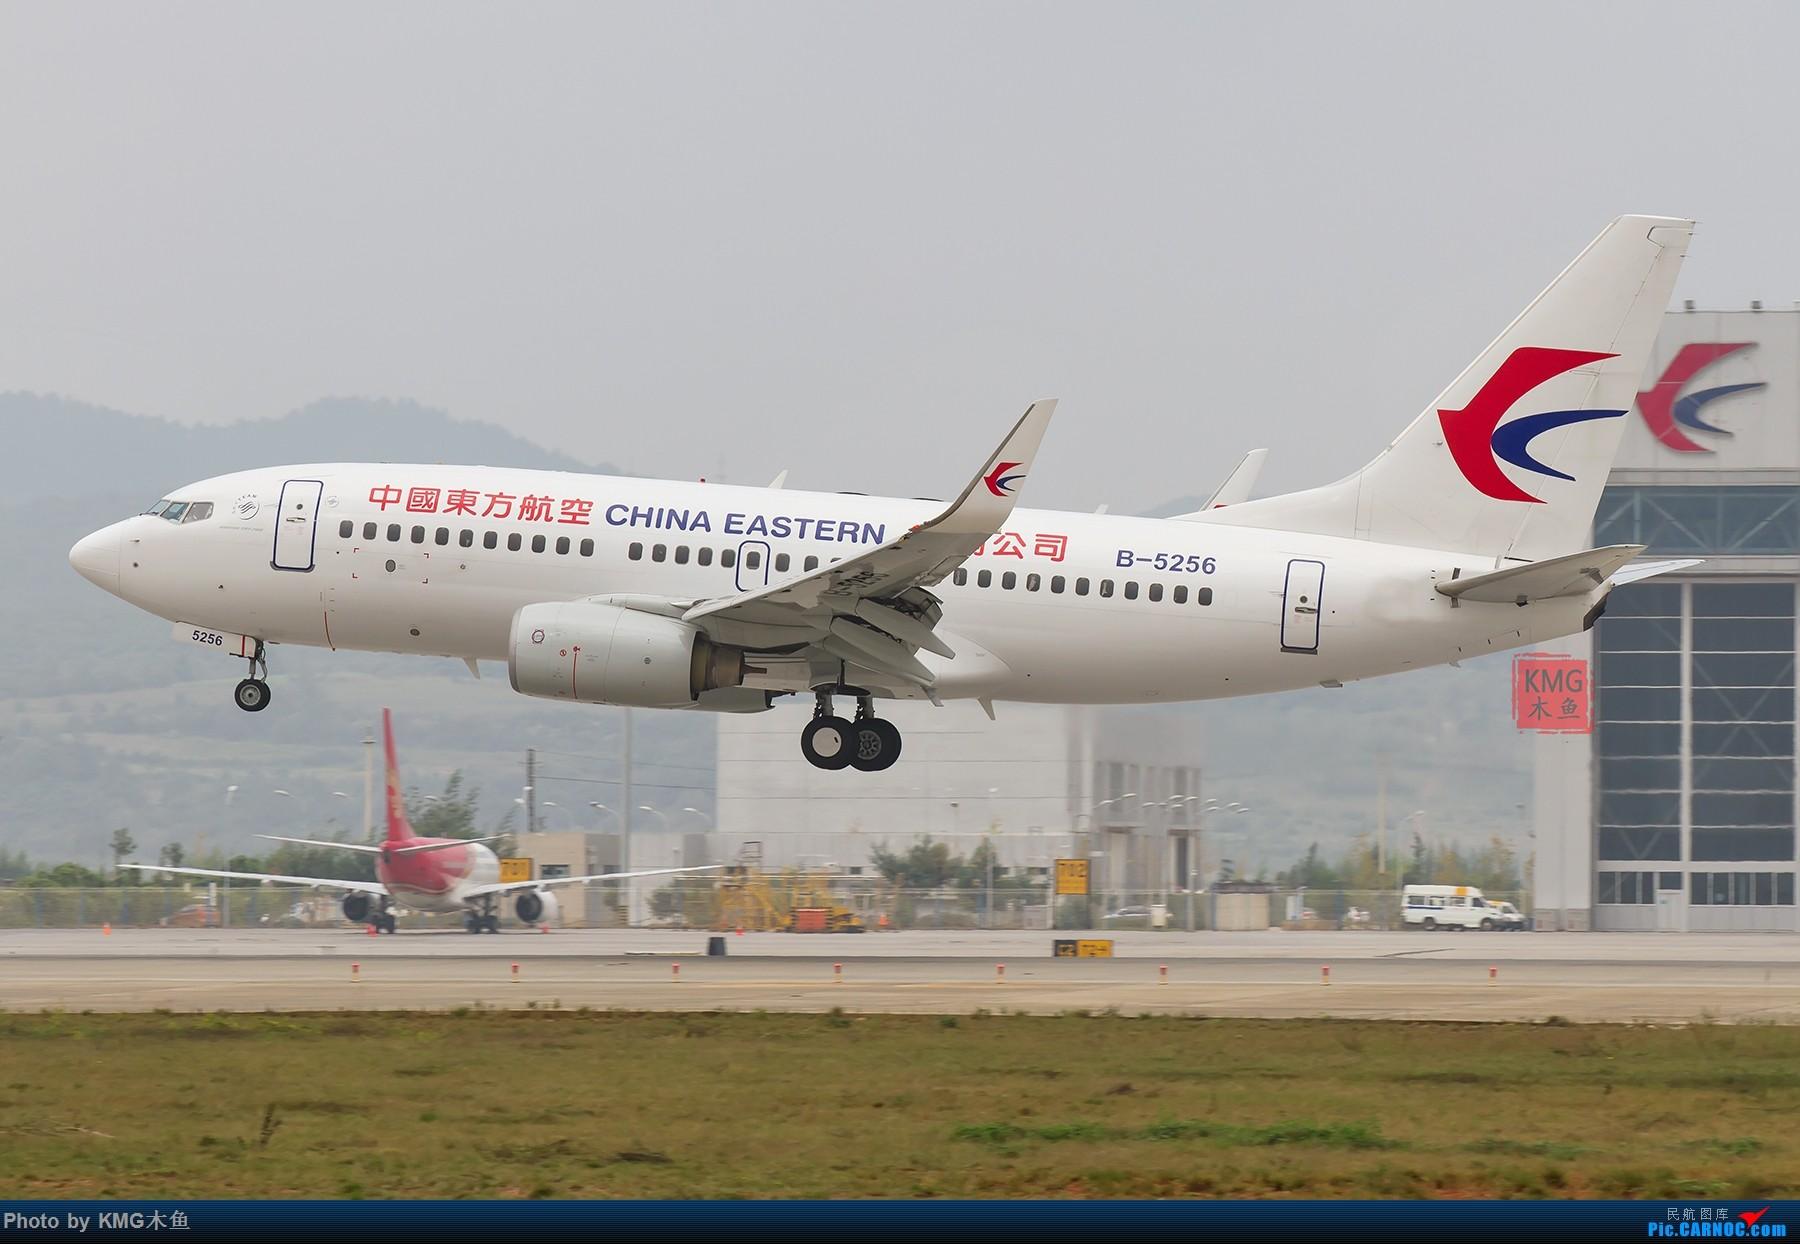 Re:[原创]【昆明长水国际机场—KMG木鱼10.16日拍机】周末拍机,有宽体,有彩绘,少了小伙伴们,独自一人拍机 BOEING 737-700 B-5256 中国昆明长水国际机场